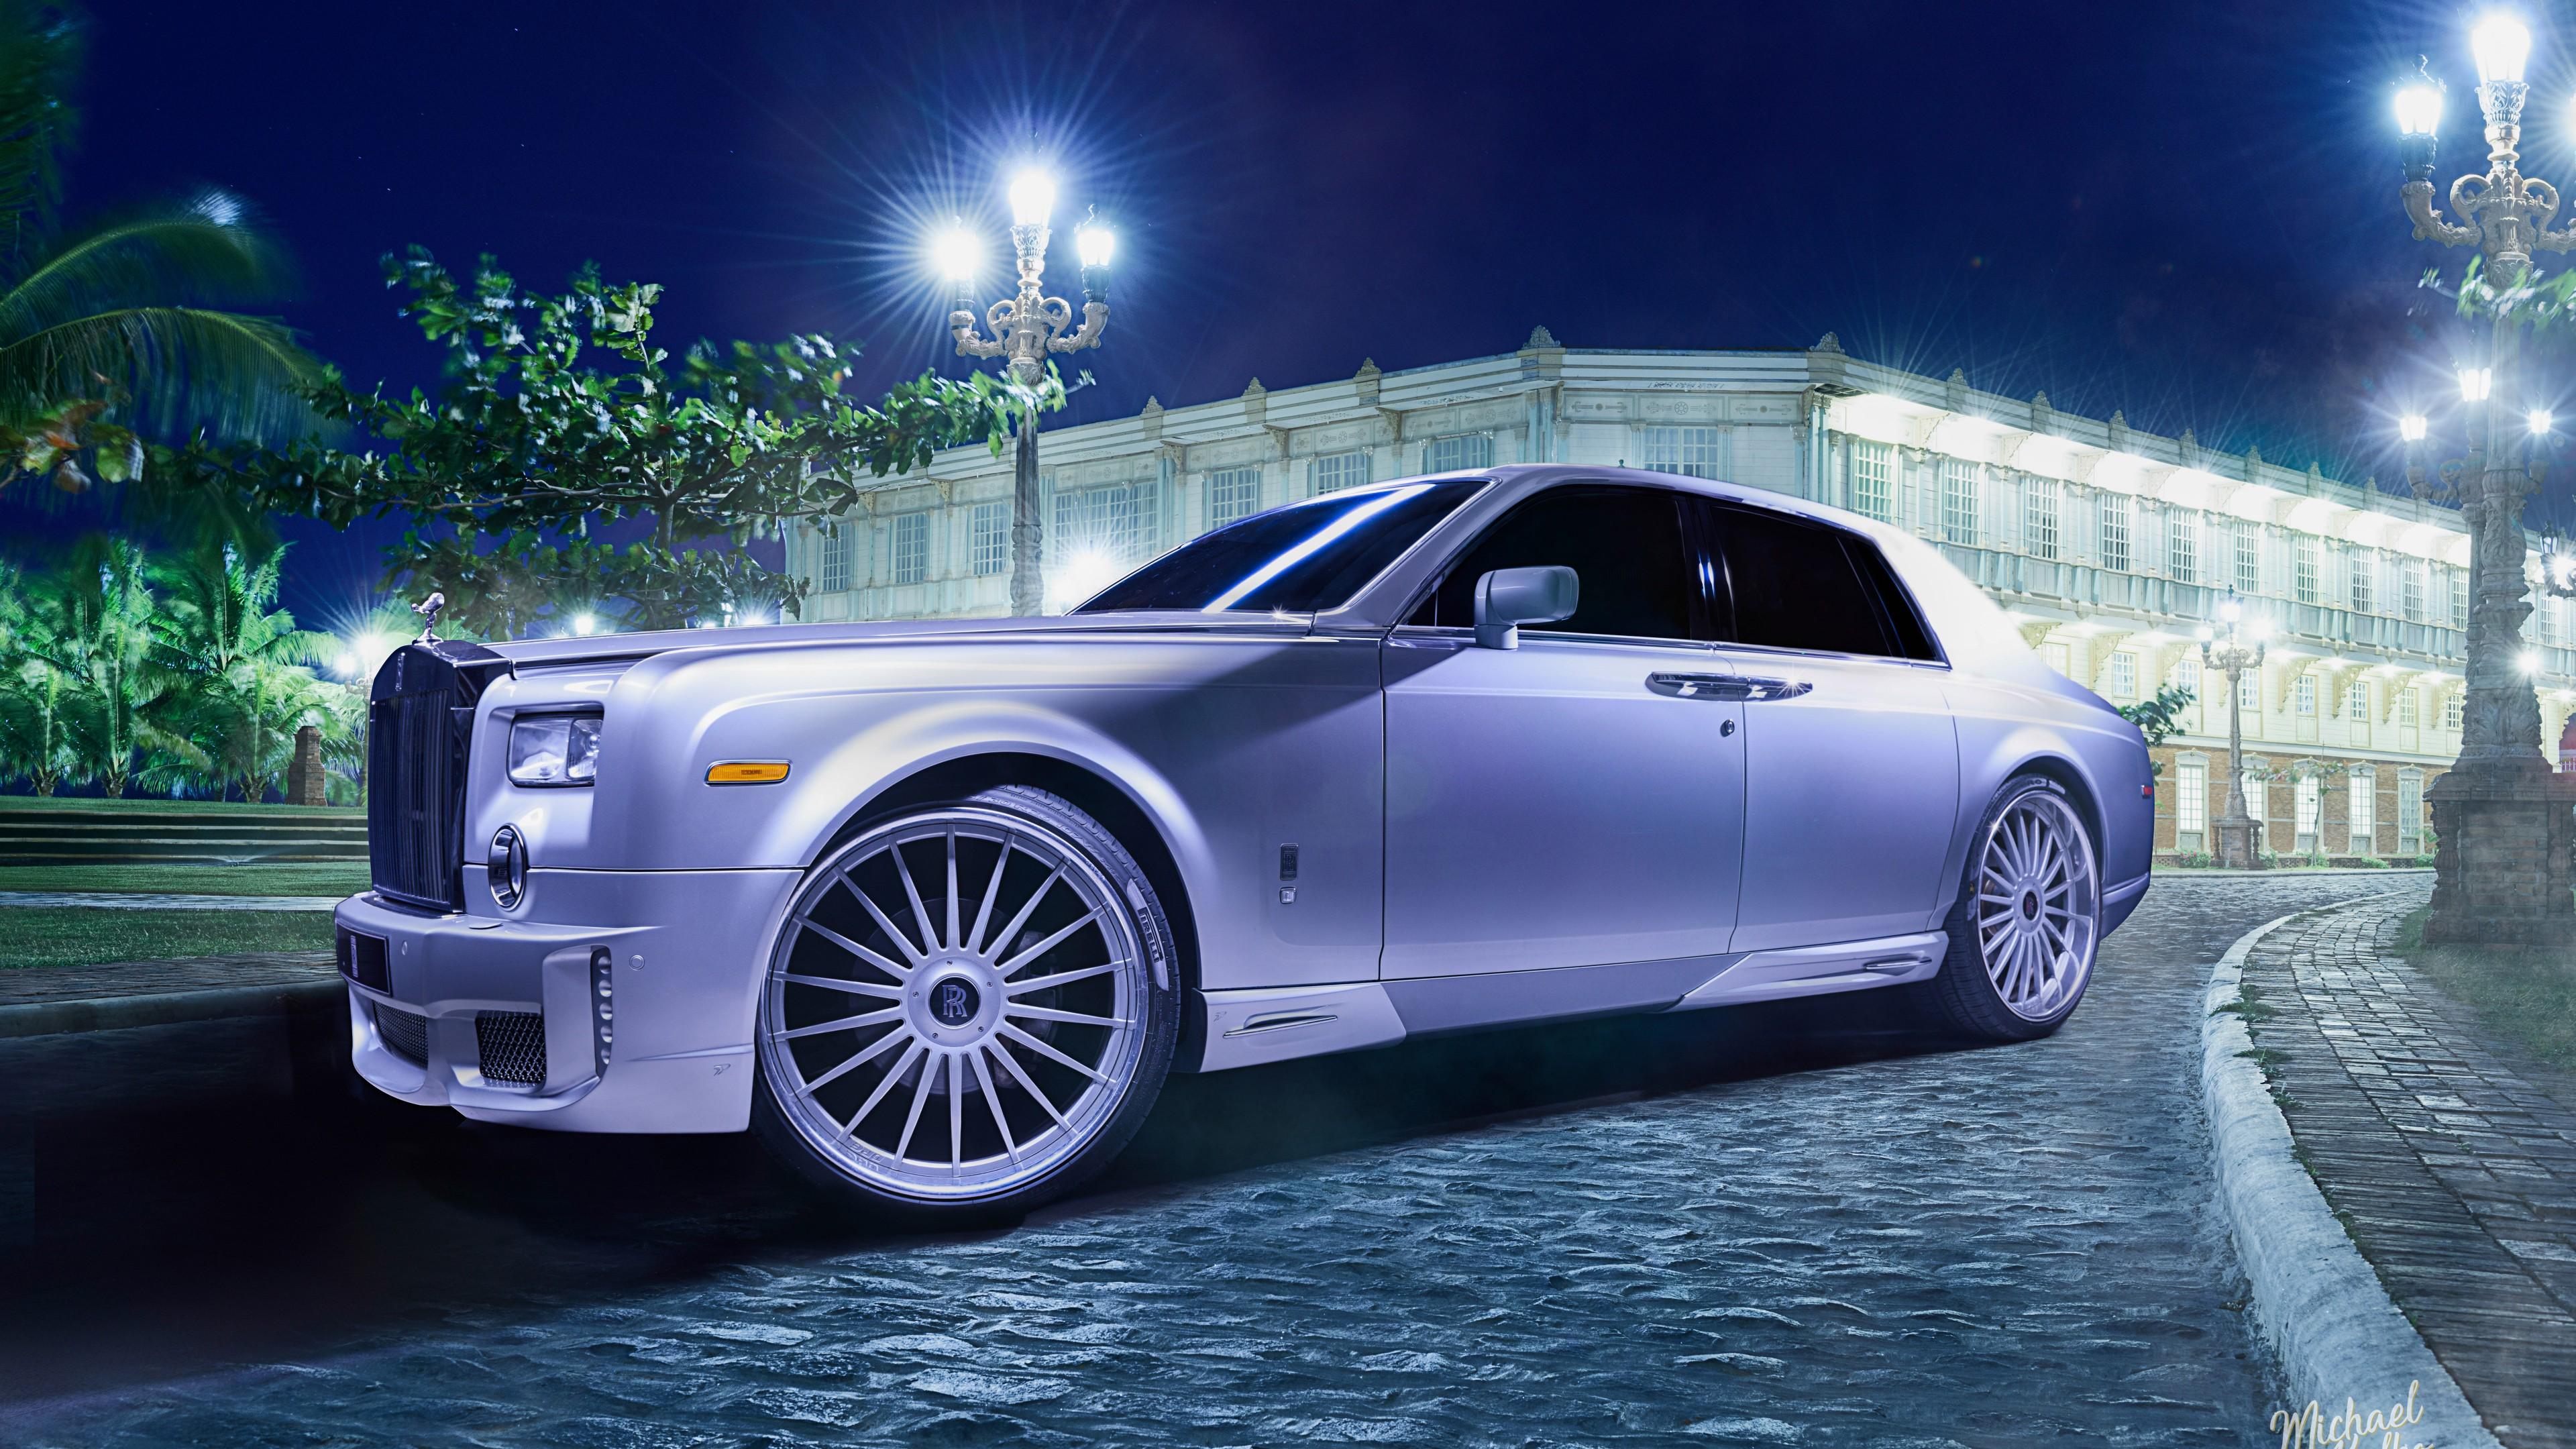 Acura Sports Car >> Rolls-Royce Ghost 4K 8K Wallpaper | HD Car Wallpapers | ID #11485